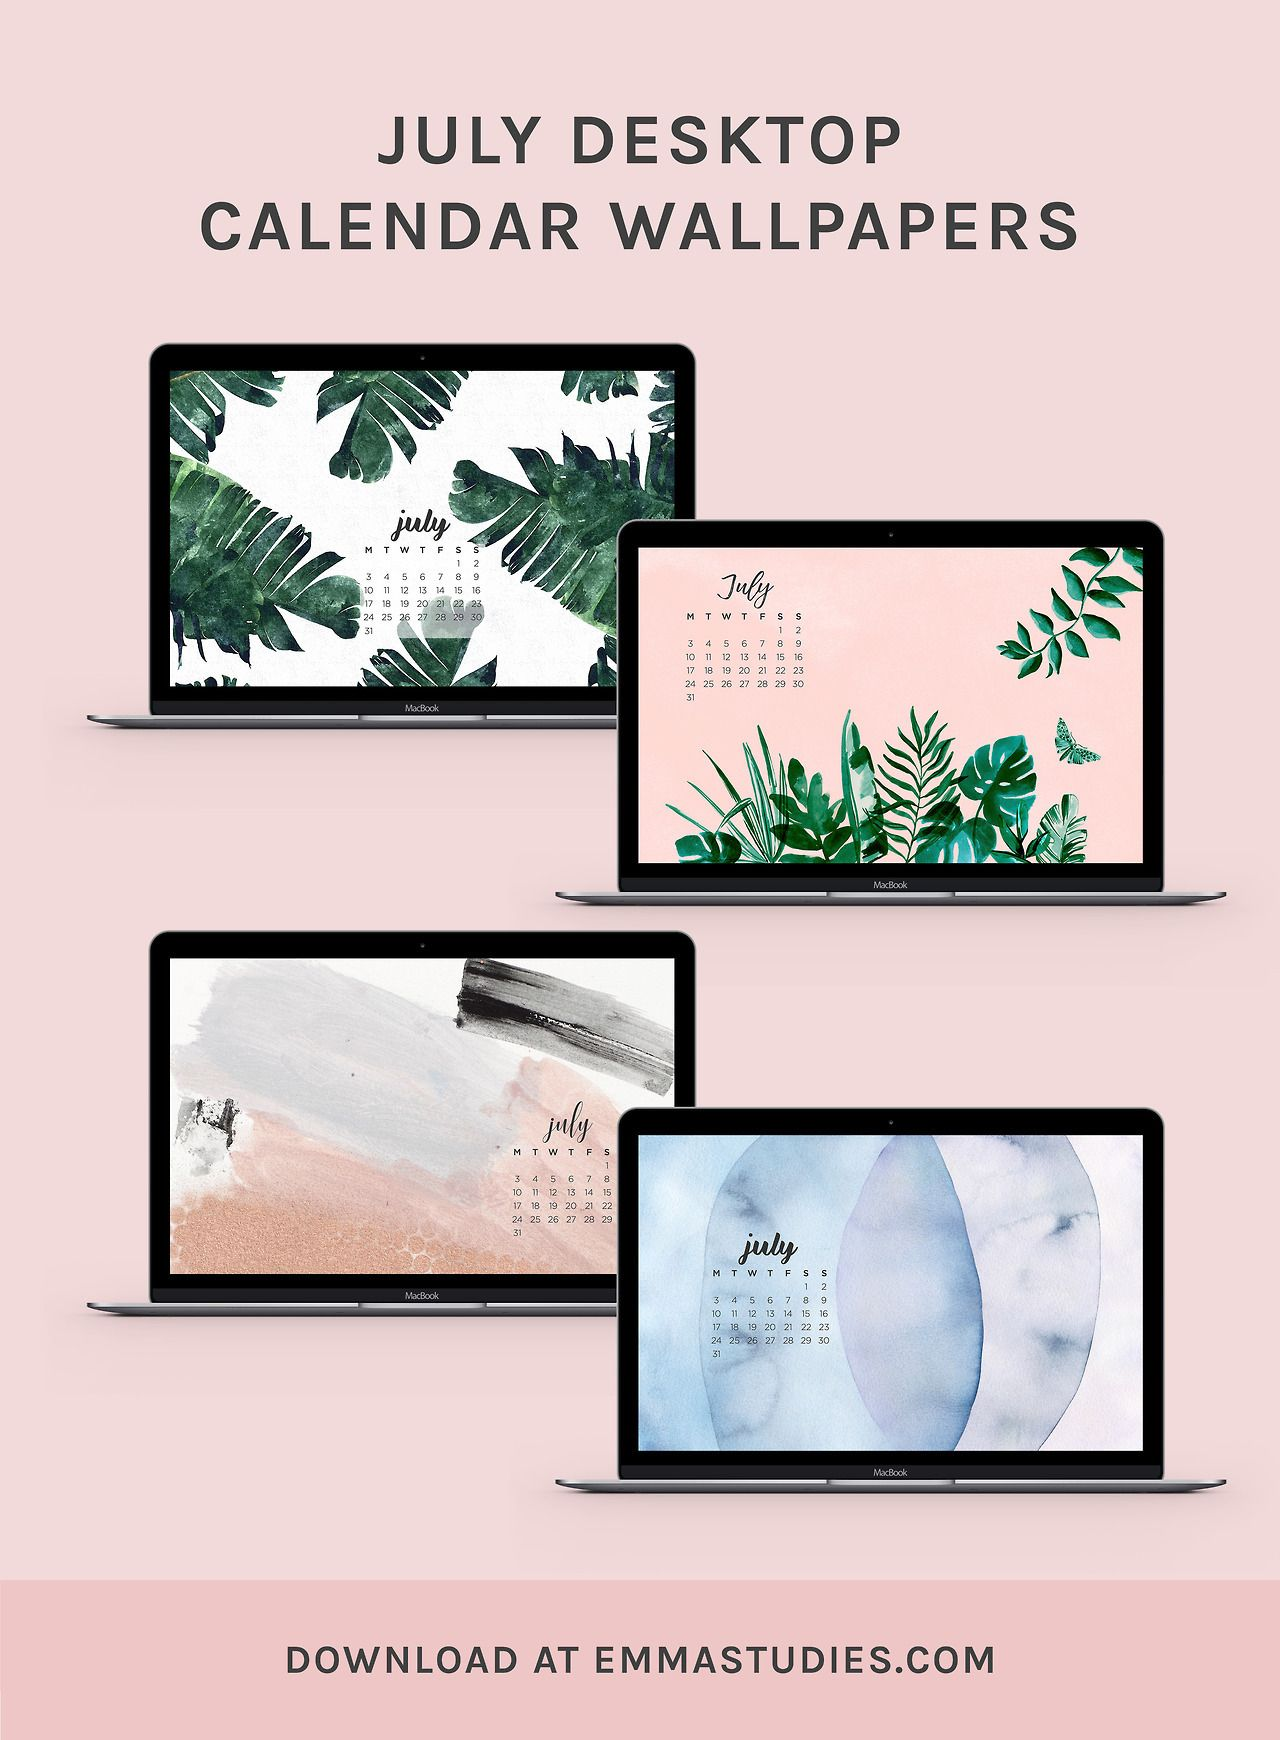 July calendar desktop wallpapers from DesignLoveFestWith